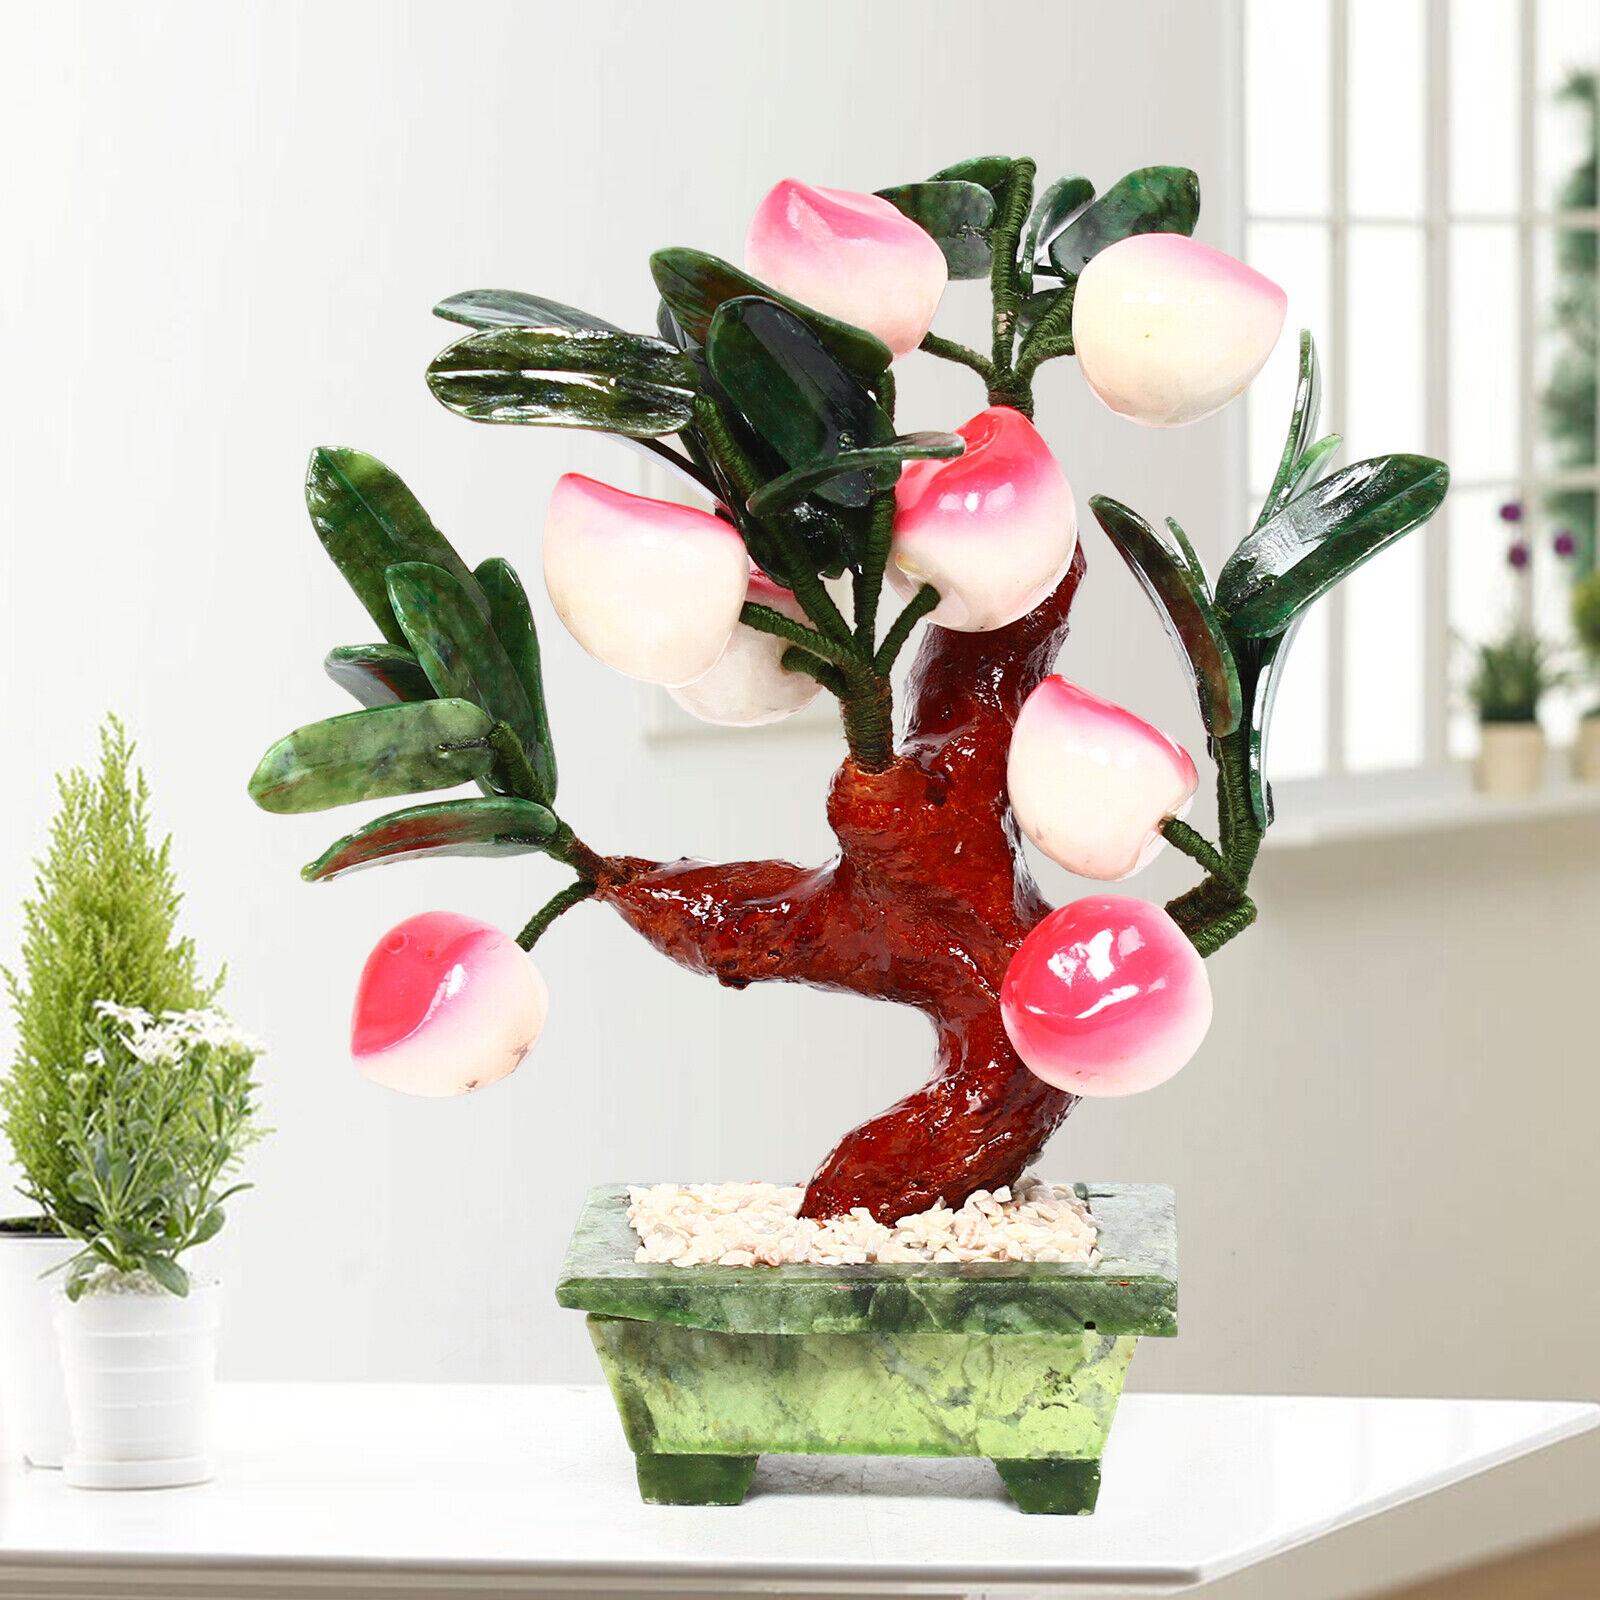 Jade Peach Bonsai Hardstone Gemstone Stone Tree Fruit Plant Decor Feng Shui Ebay